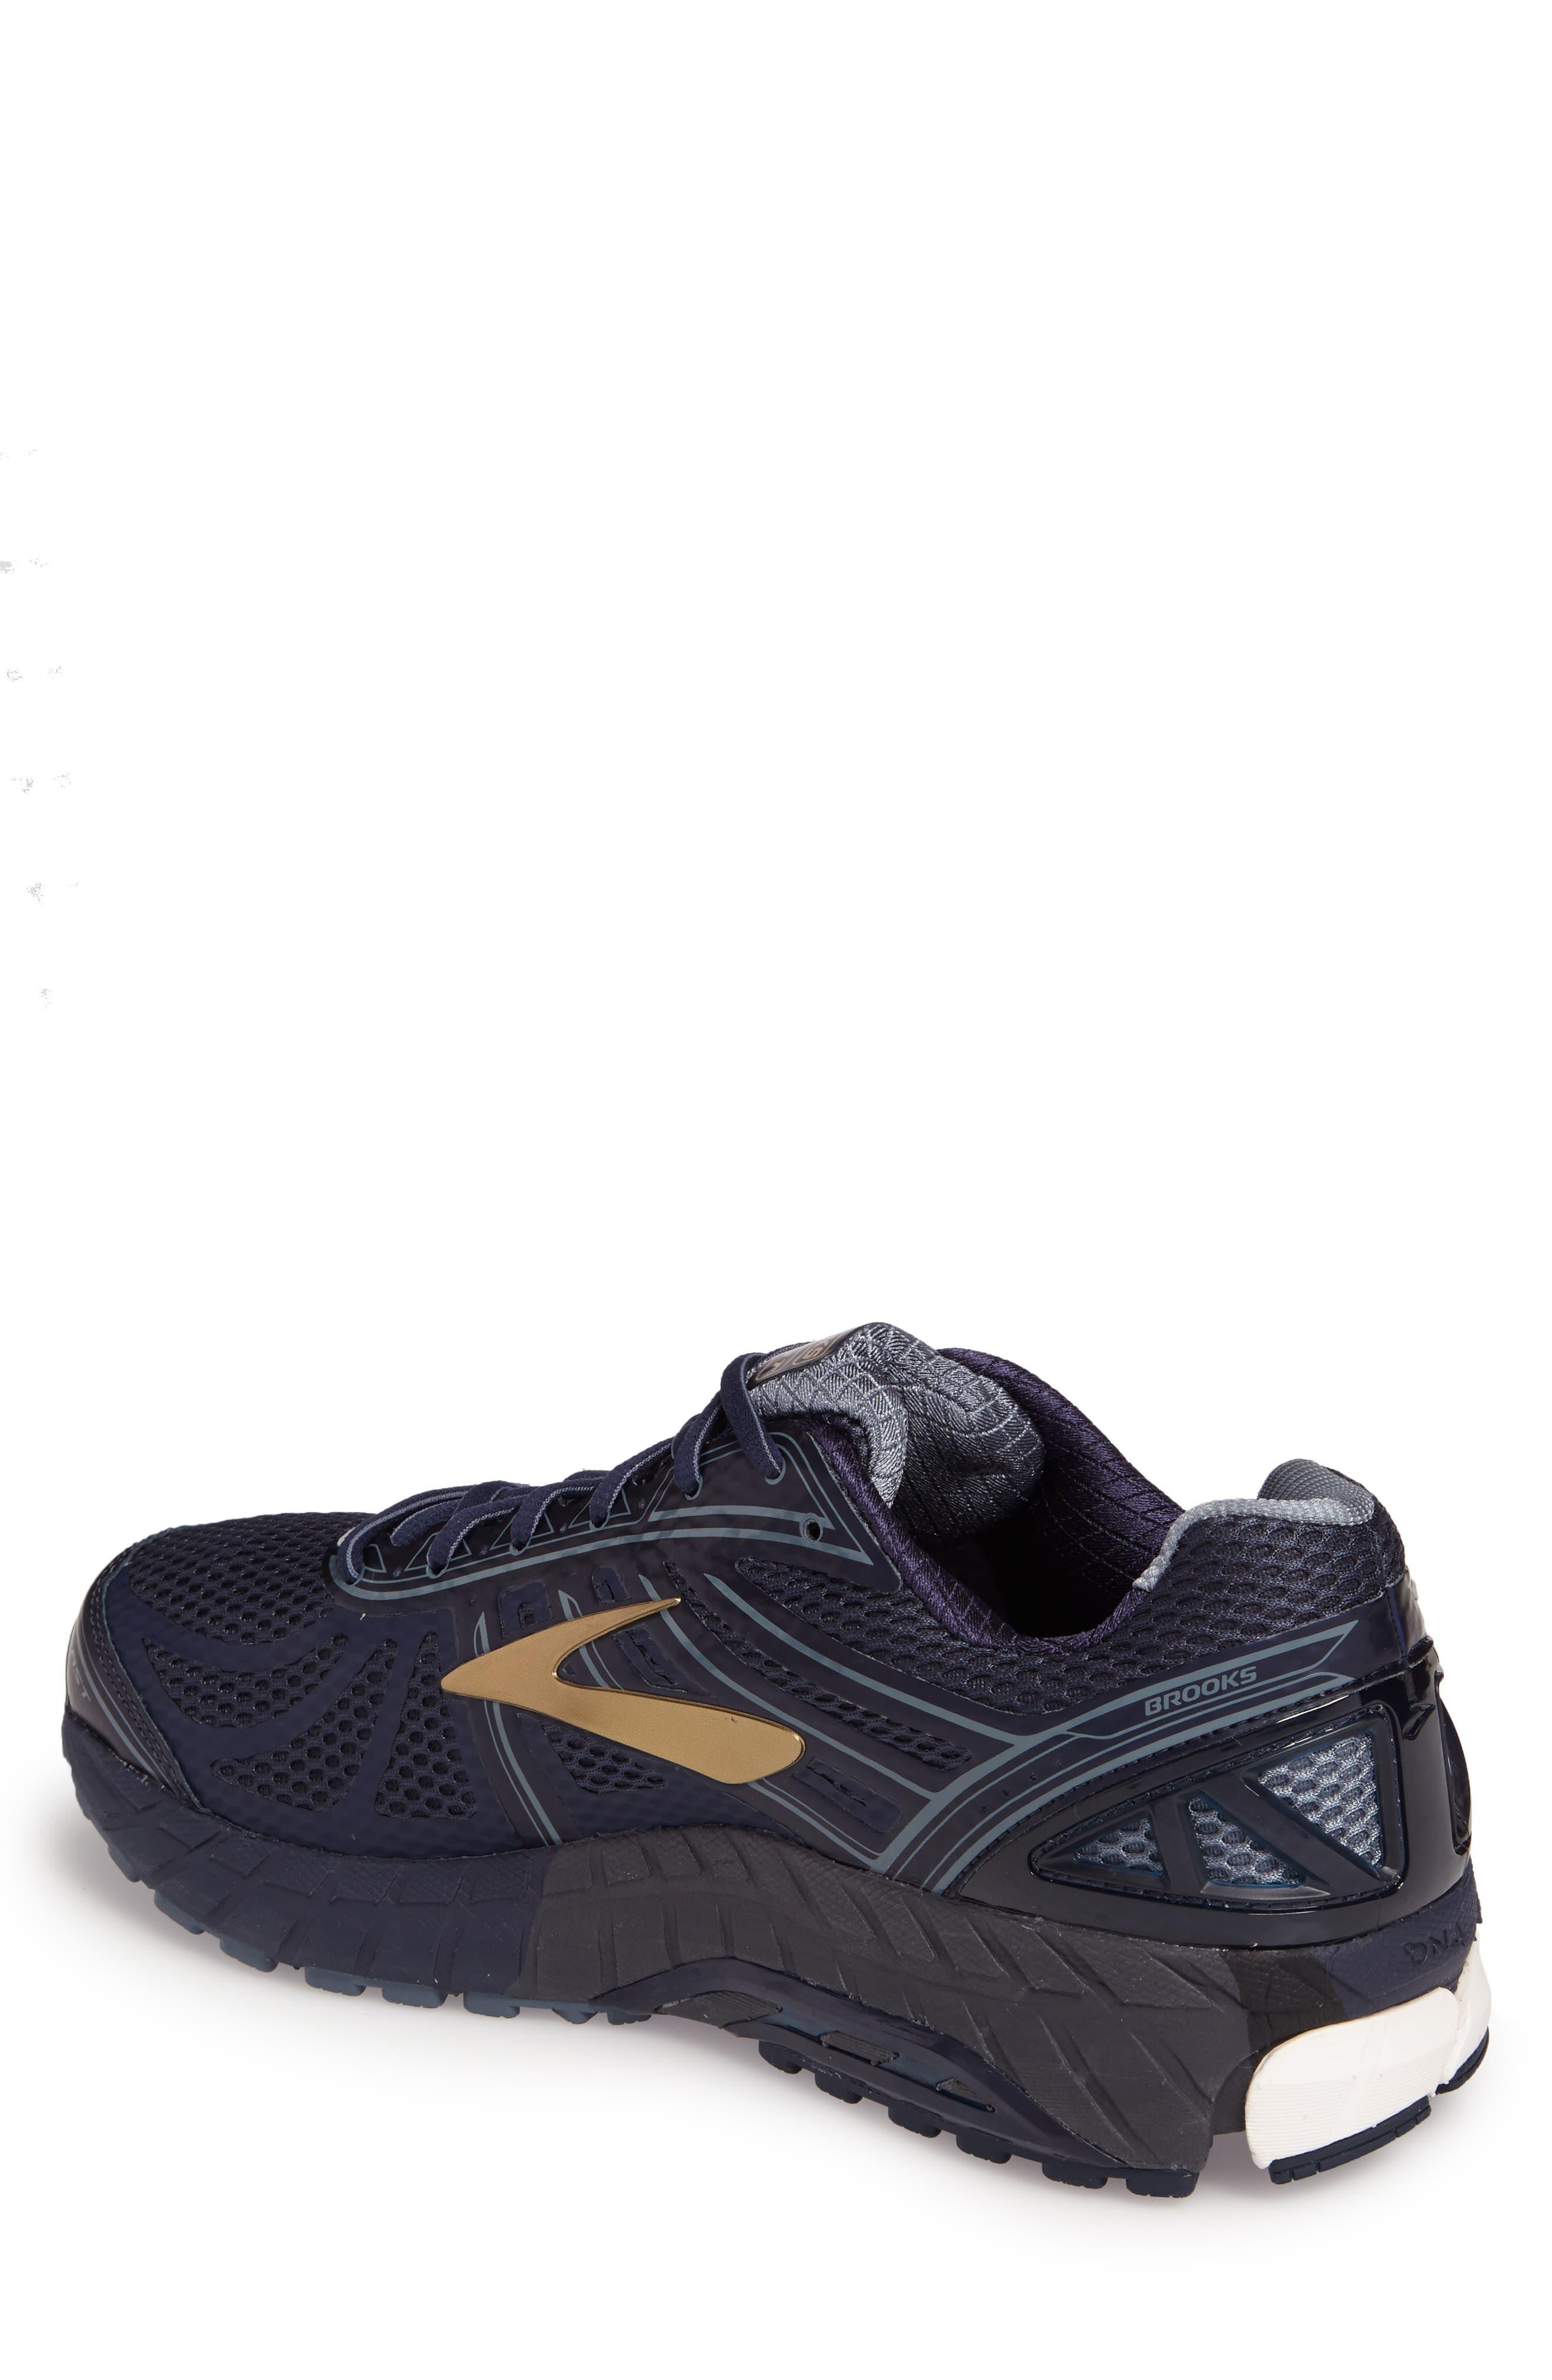 'Beast 16' Running Shoe,                             Alternate thumbnail 6, color,